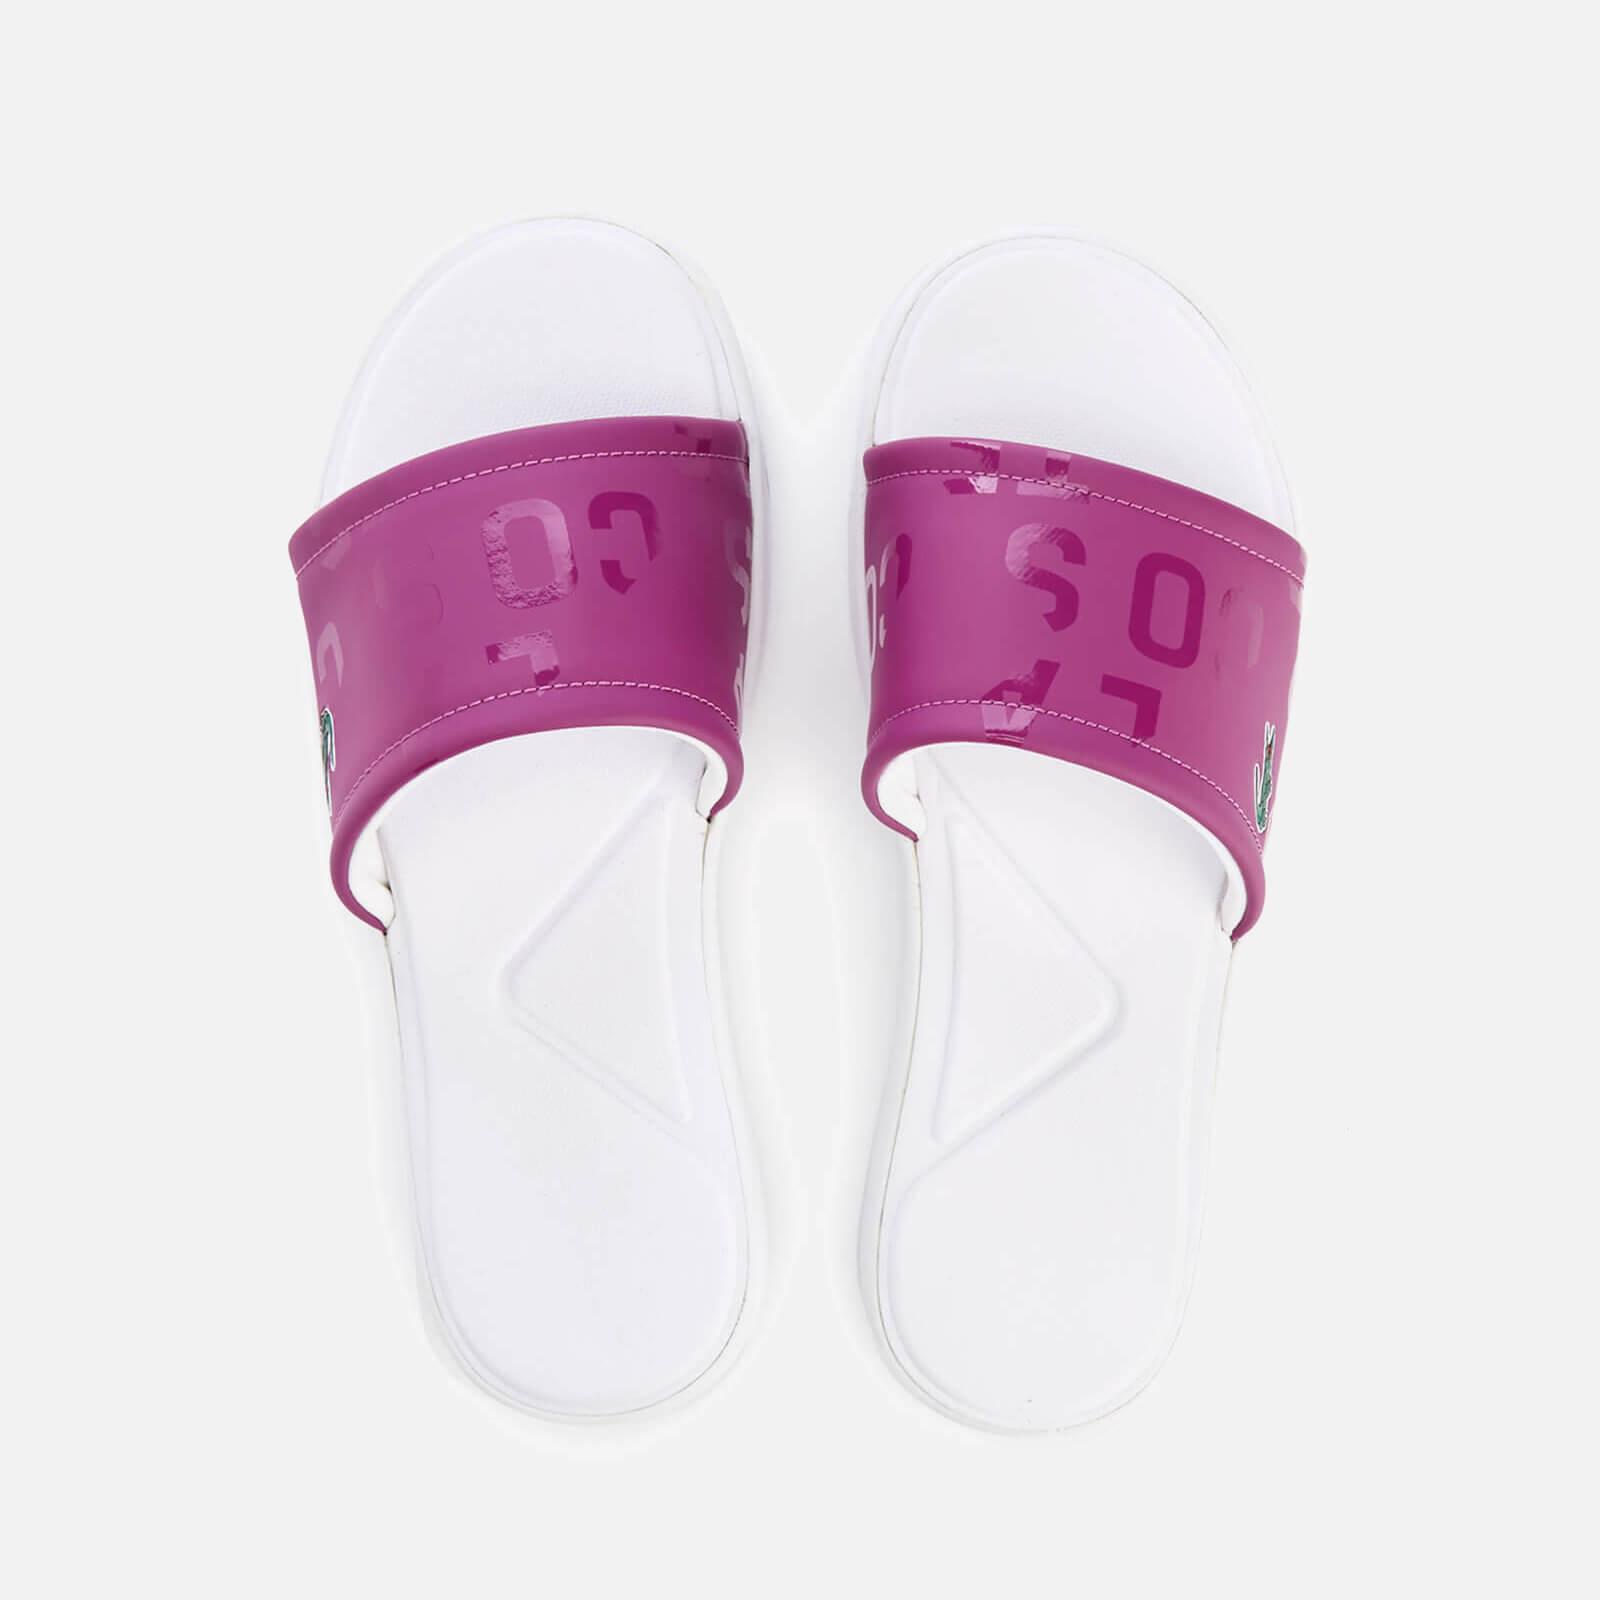 7177954f777922 Lacoste Women s L.30 Slide 117 1 Slide Sandals - Purple - Free UK Delivery  over £50